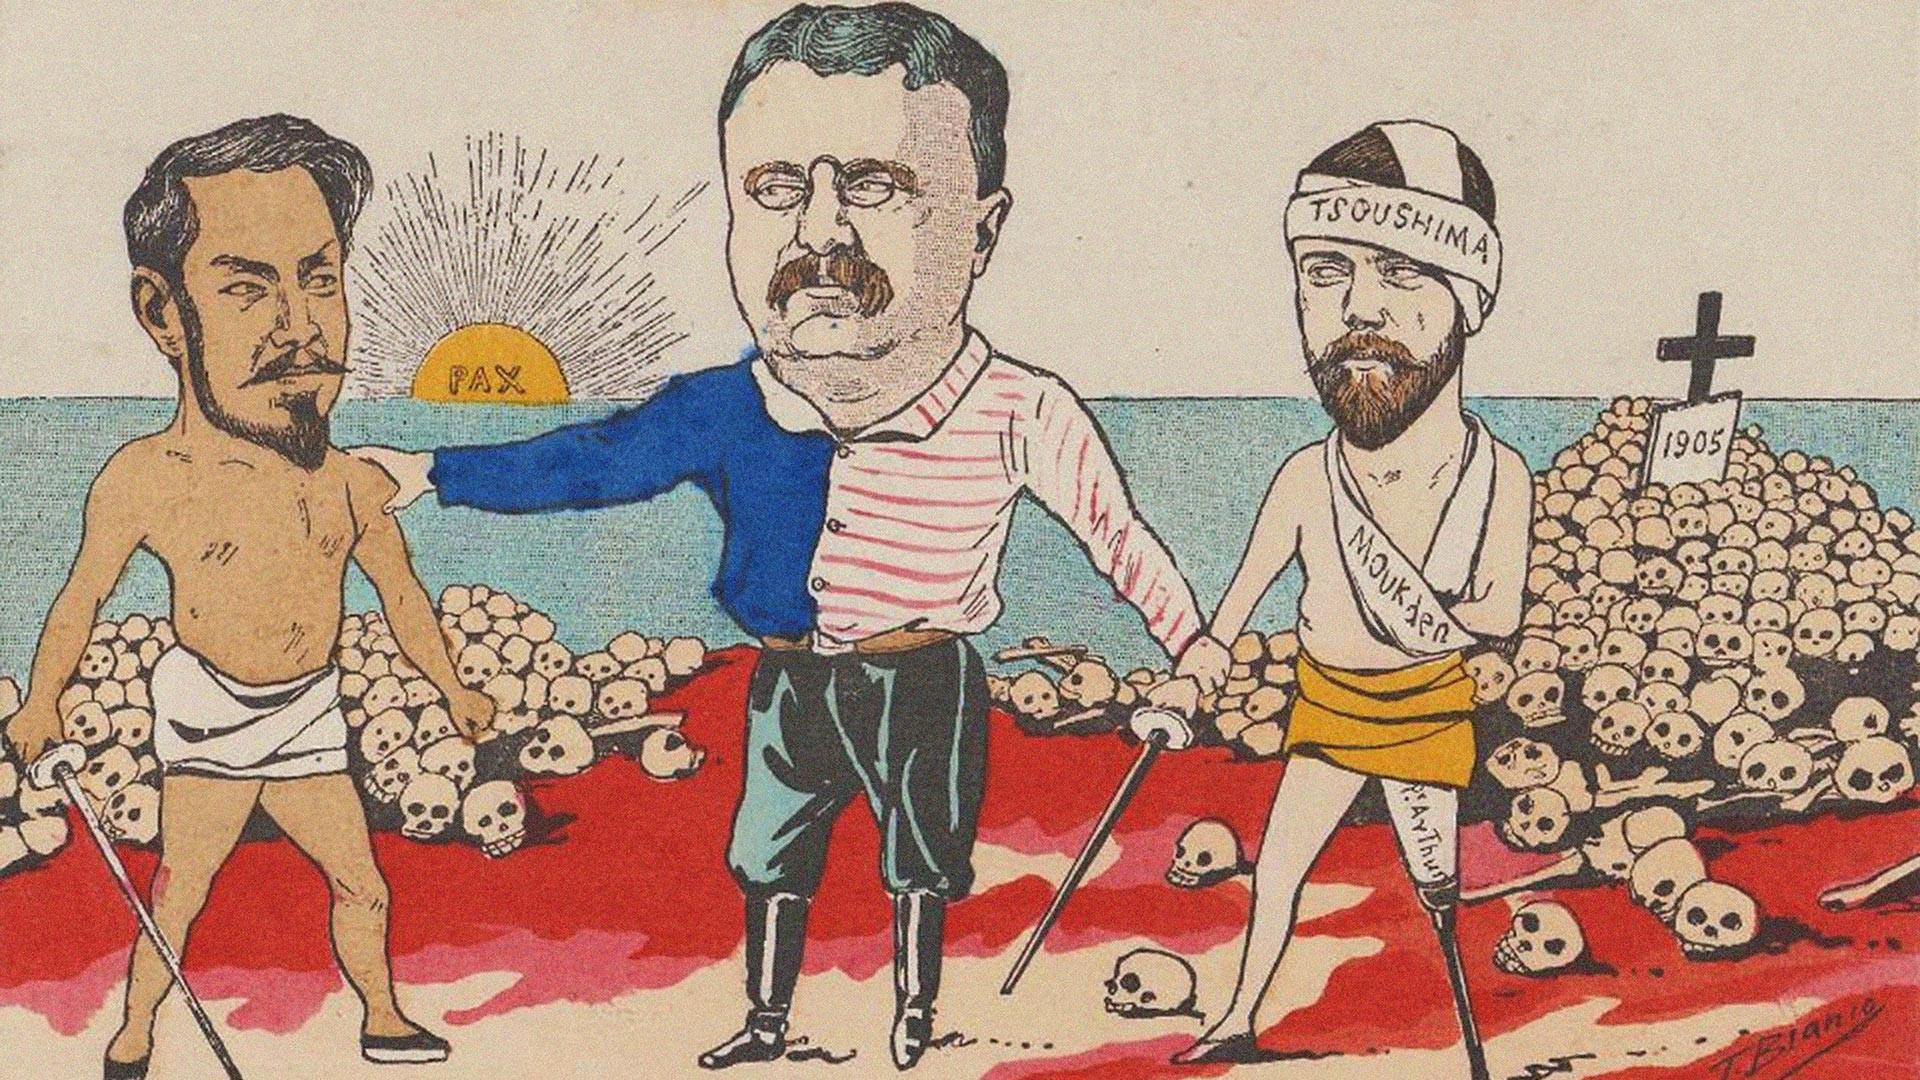 Una caricatura del Tratado de Portsmouth, 1905.